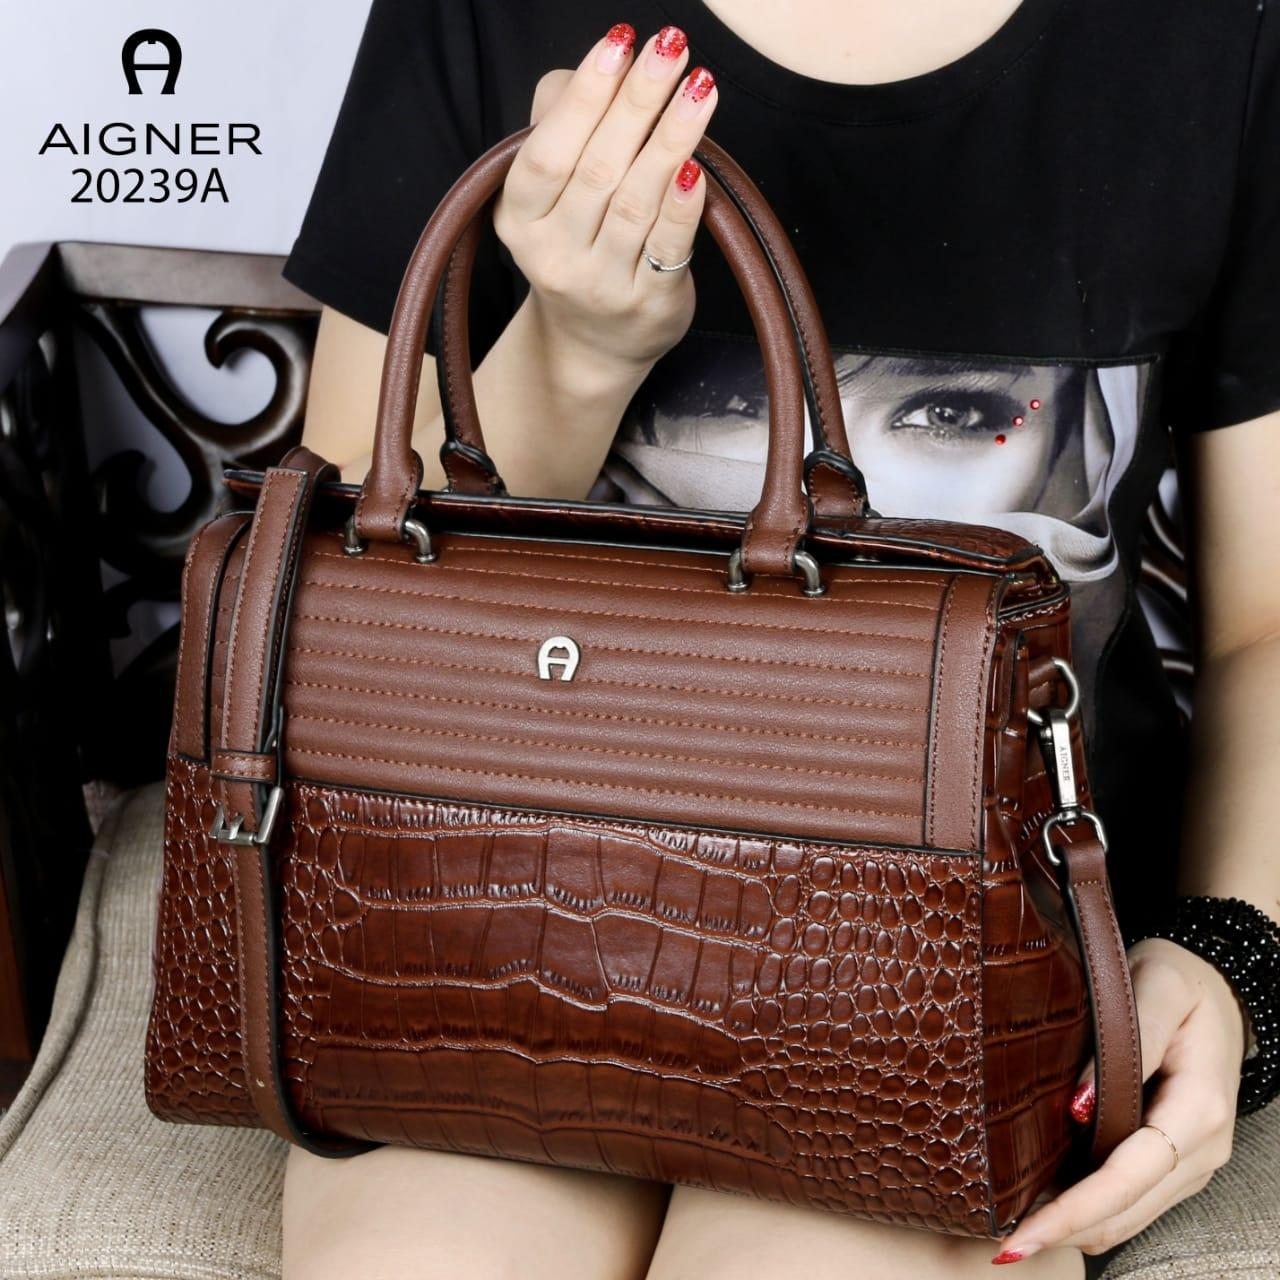 Tas wanita Aigner slingbag mewah branded import new arrival batam murah  selempang cewek fashion elegan pesta e52780a59b